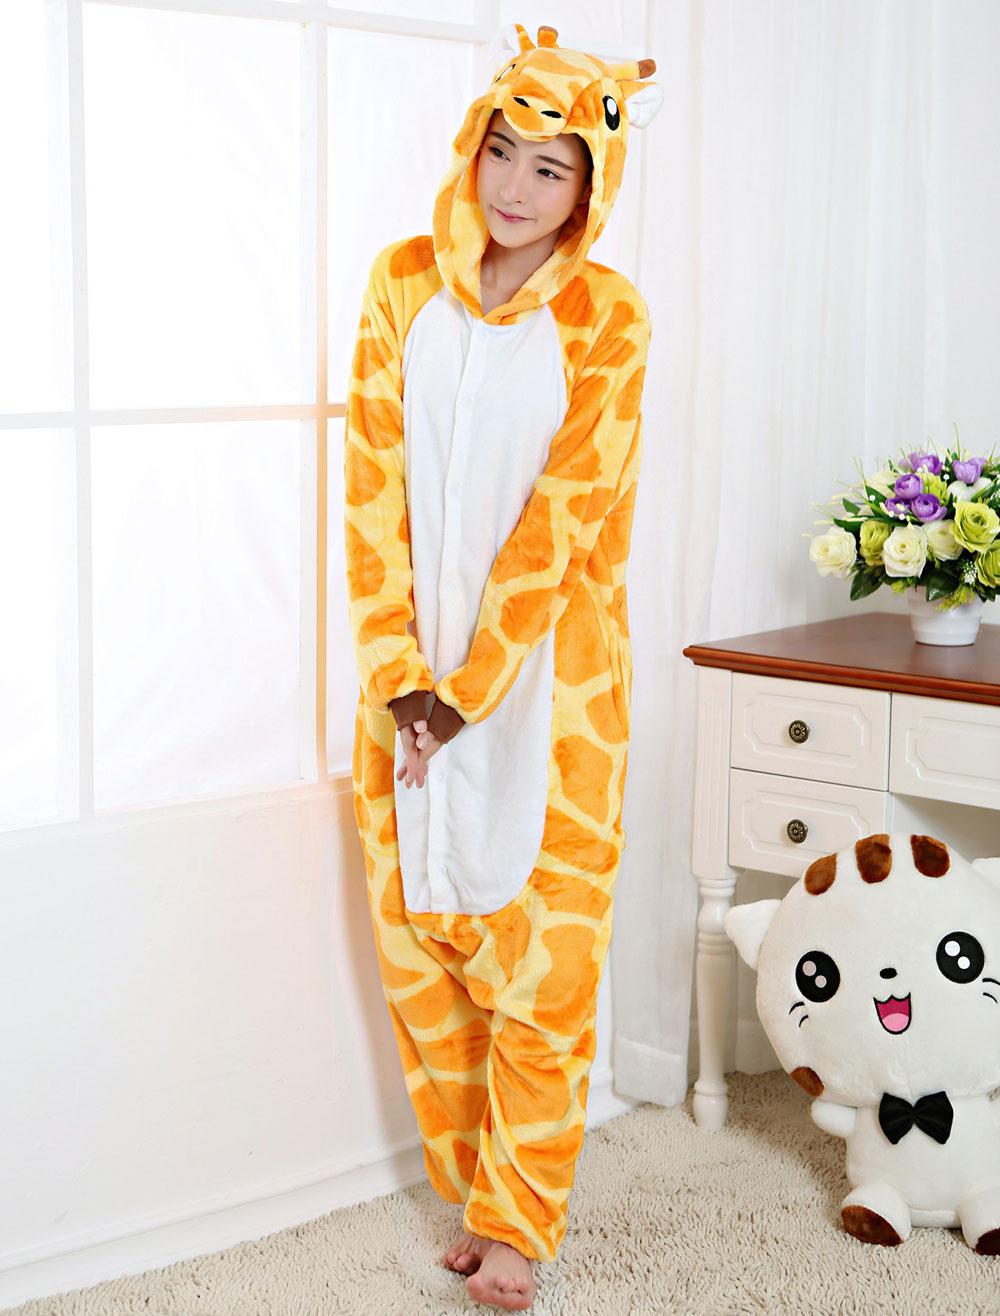 ... Кигуруми Пижама Жираф Онеси Желтый фланель животных Sleepwear для  взрослых Хэллоуин-No.4 ... 7cdb7ce4073a7